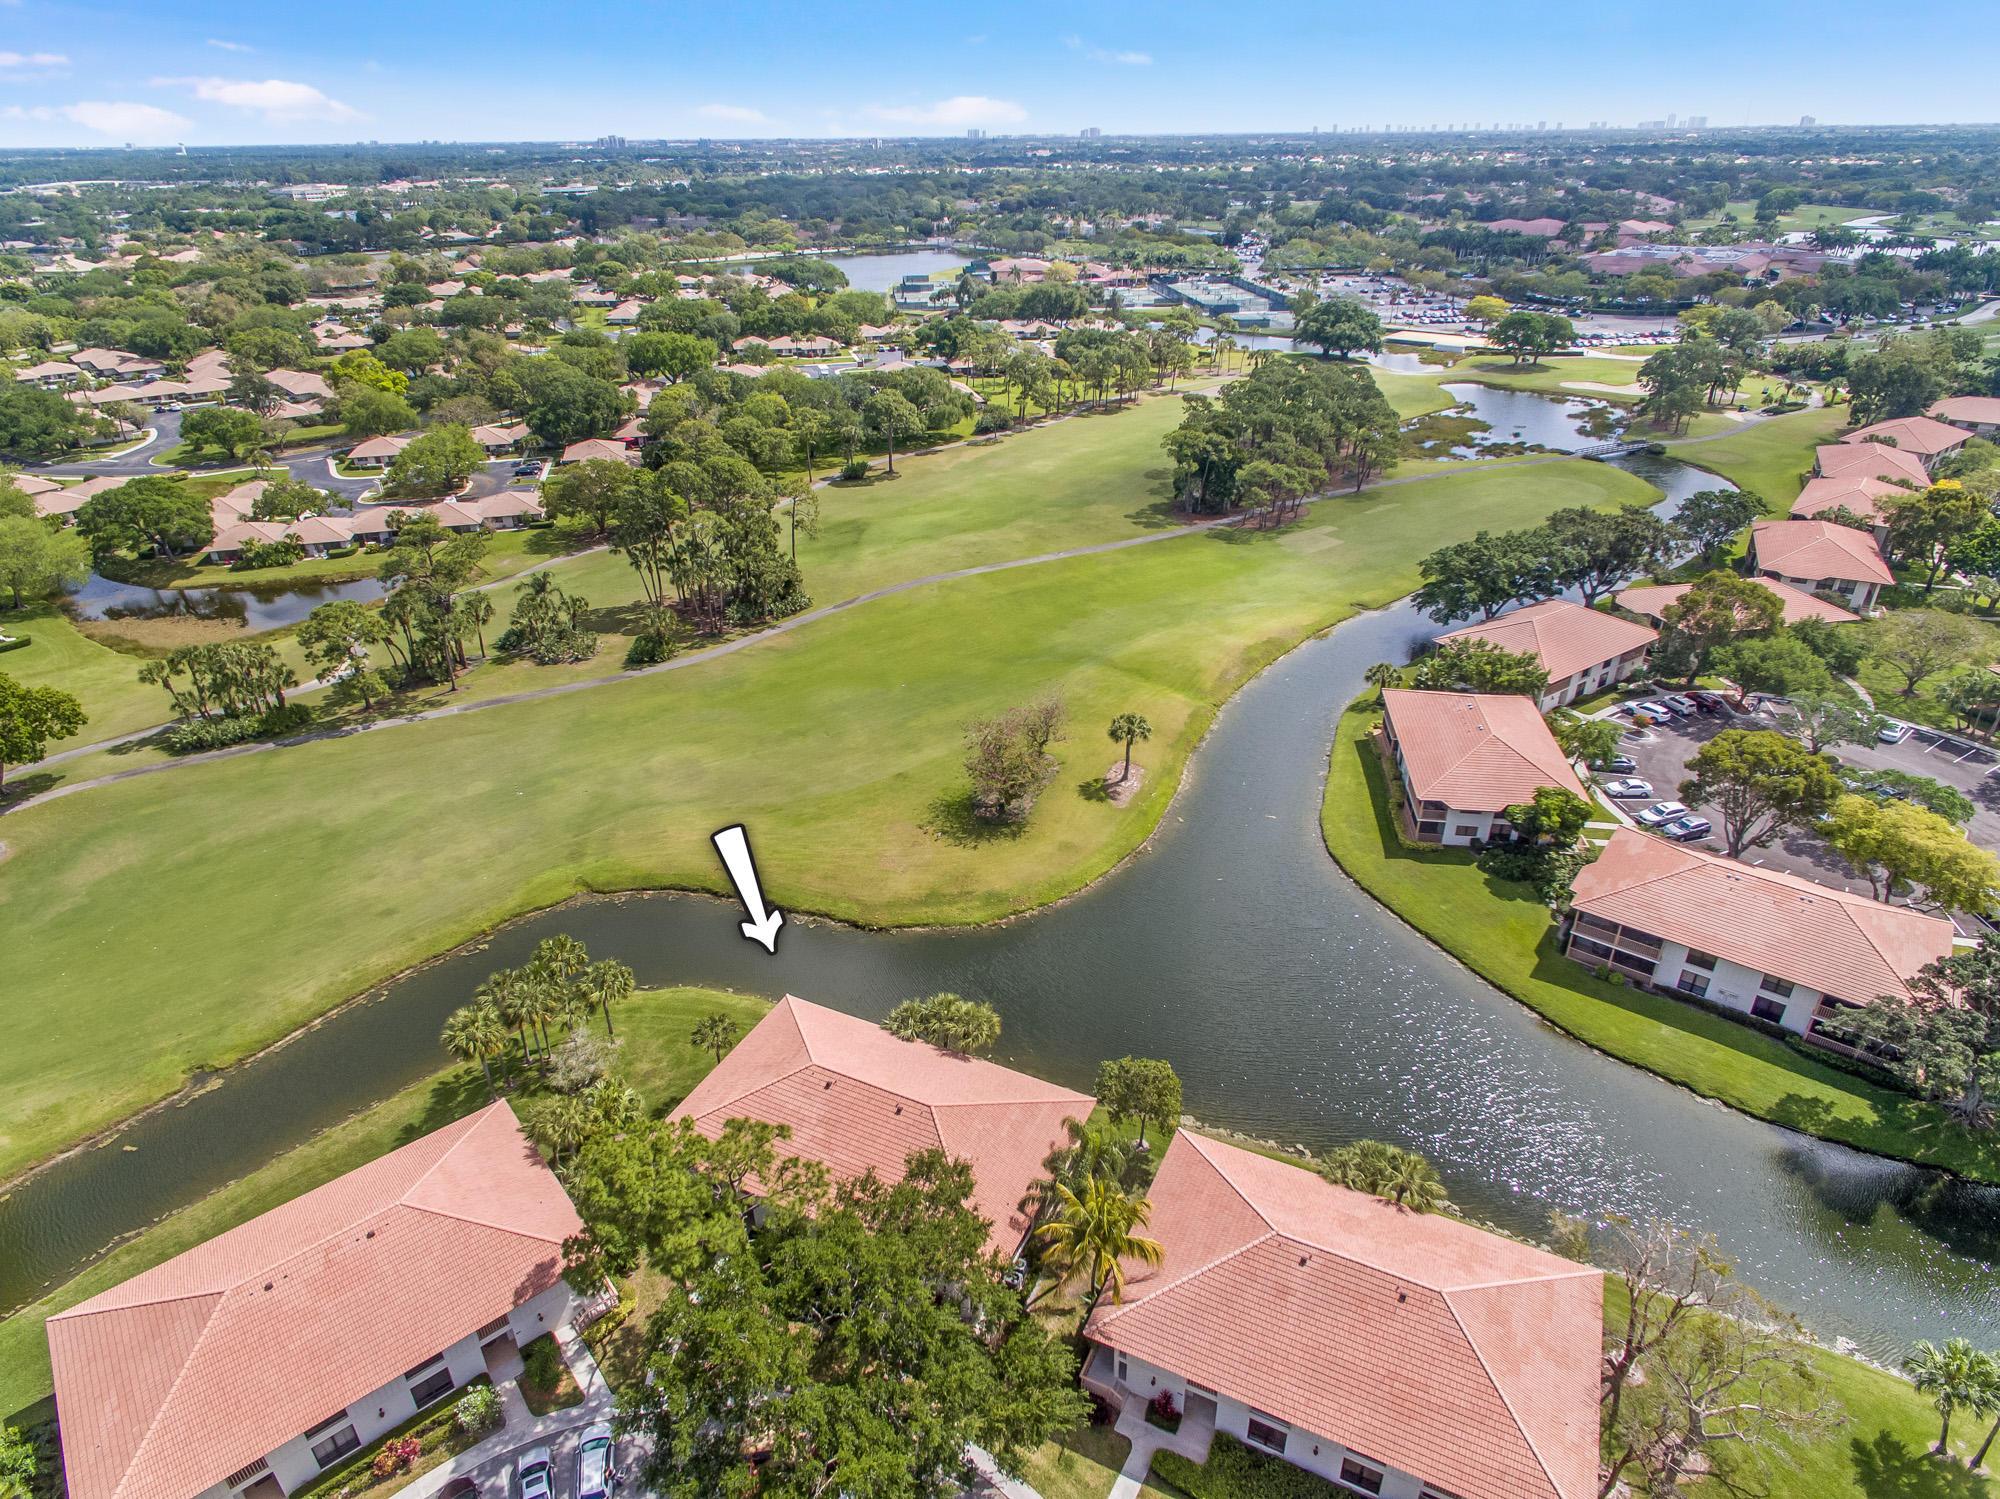 651 Brackenwood Cove, Palm Beach Gardens, Florida 33418, 2 Bedrooms Bedrooms, ,2 BathroomsBathrooms,A,Condominium,Brackenwood,RX-10609509